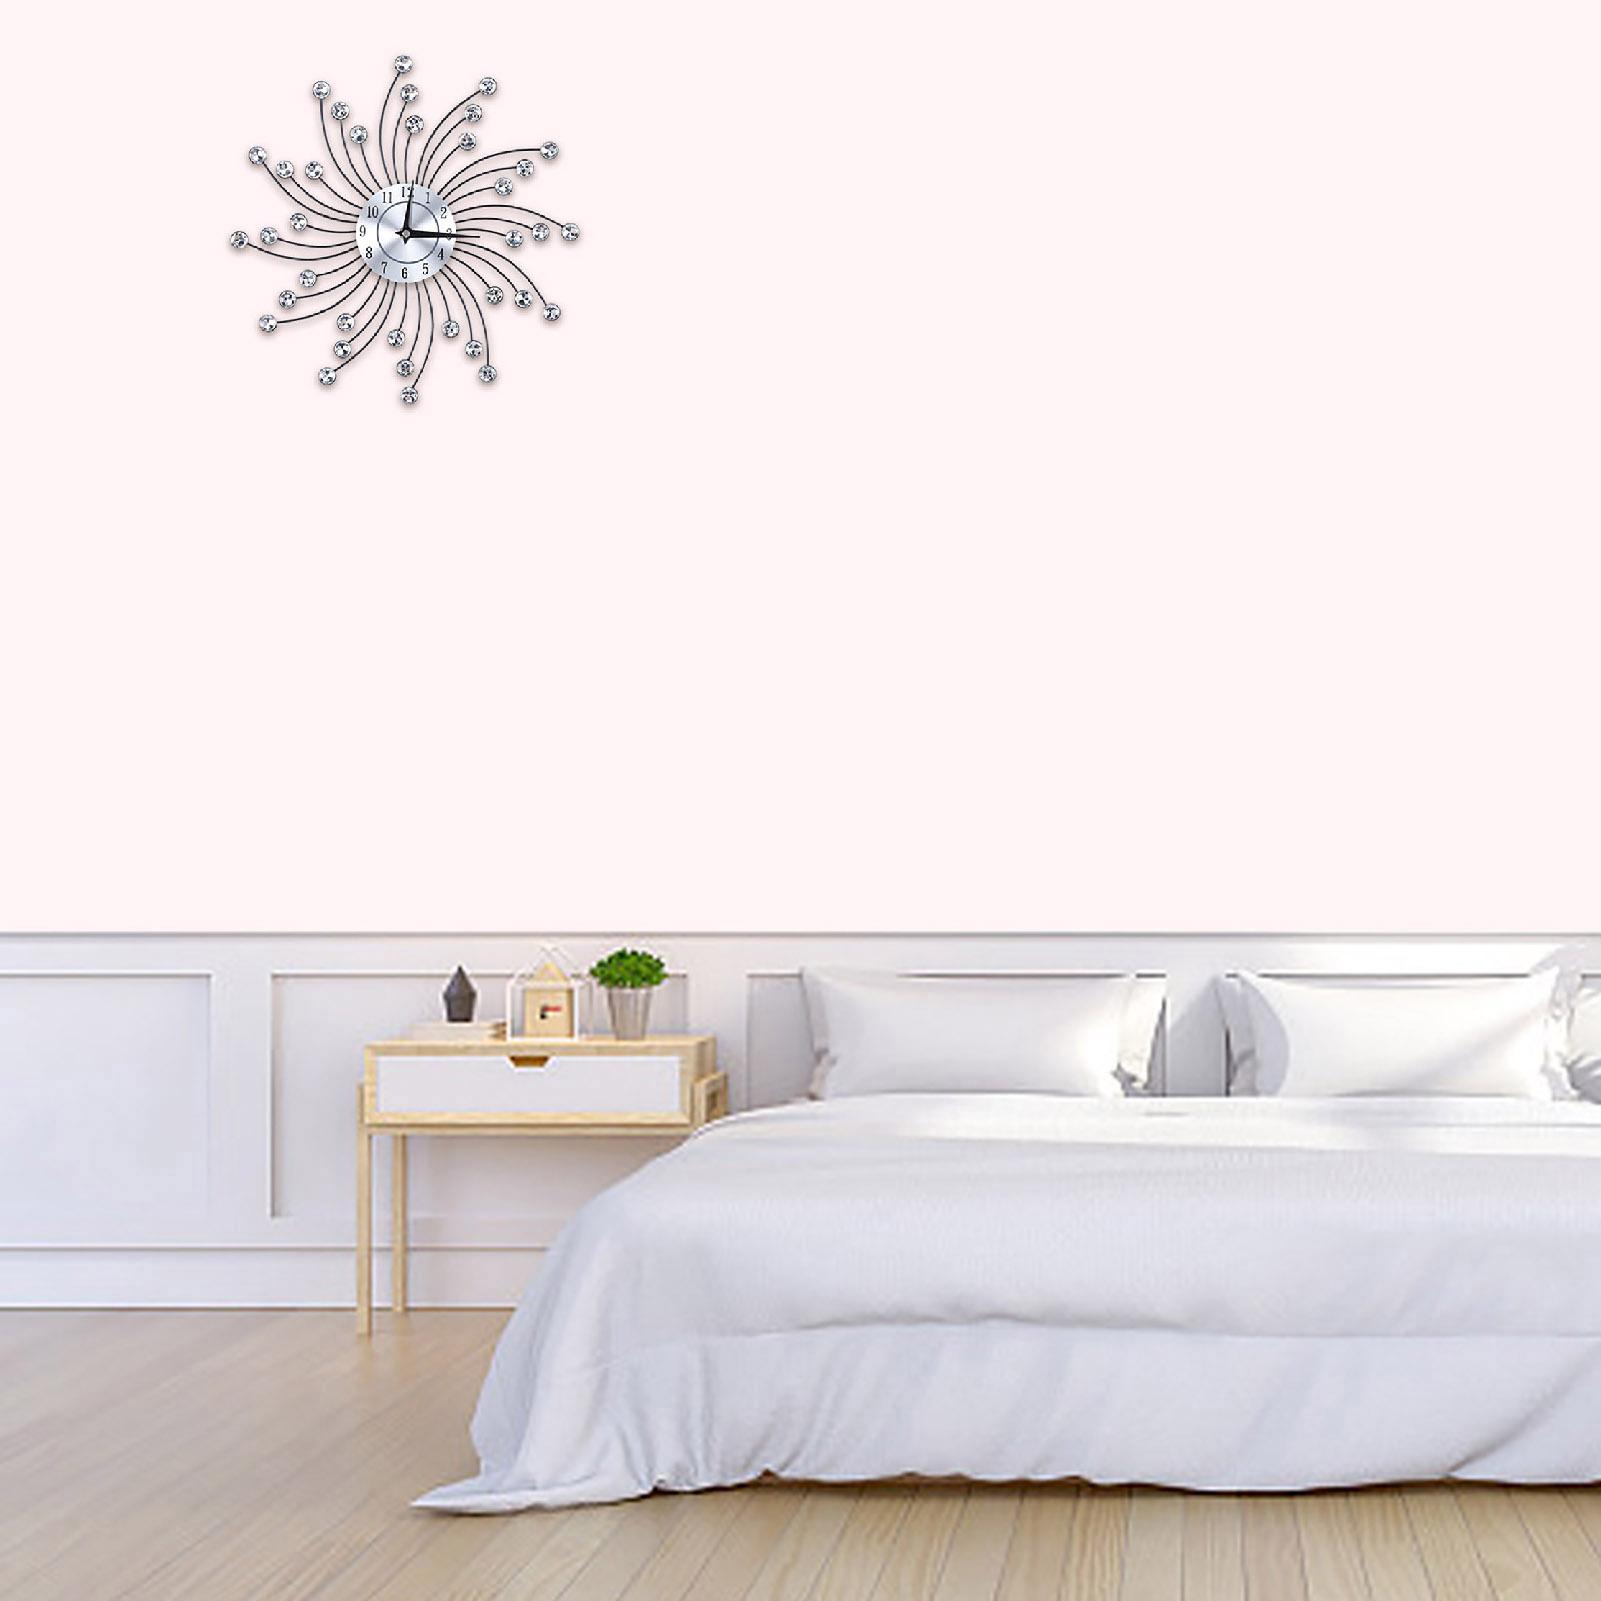 Sparkling-Bling-Metallic-DIY-Flower-Shaped-Wall-Clock-for-Living-Room-Office miniature 18